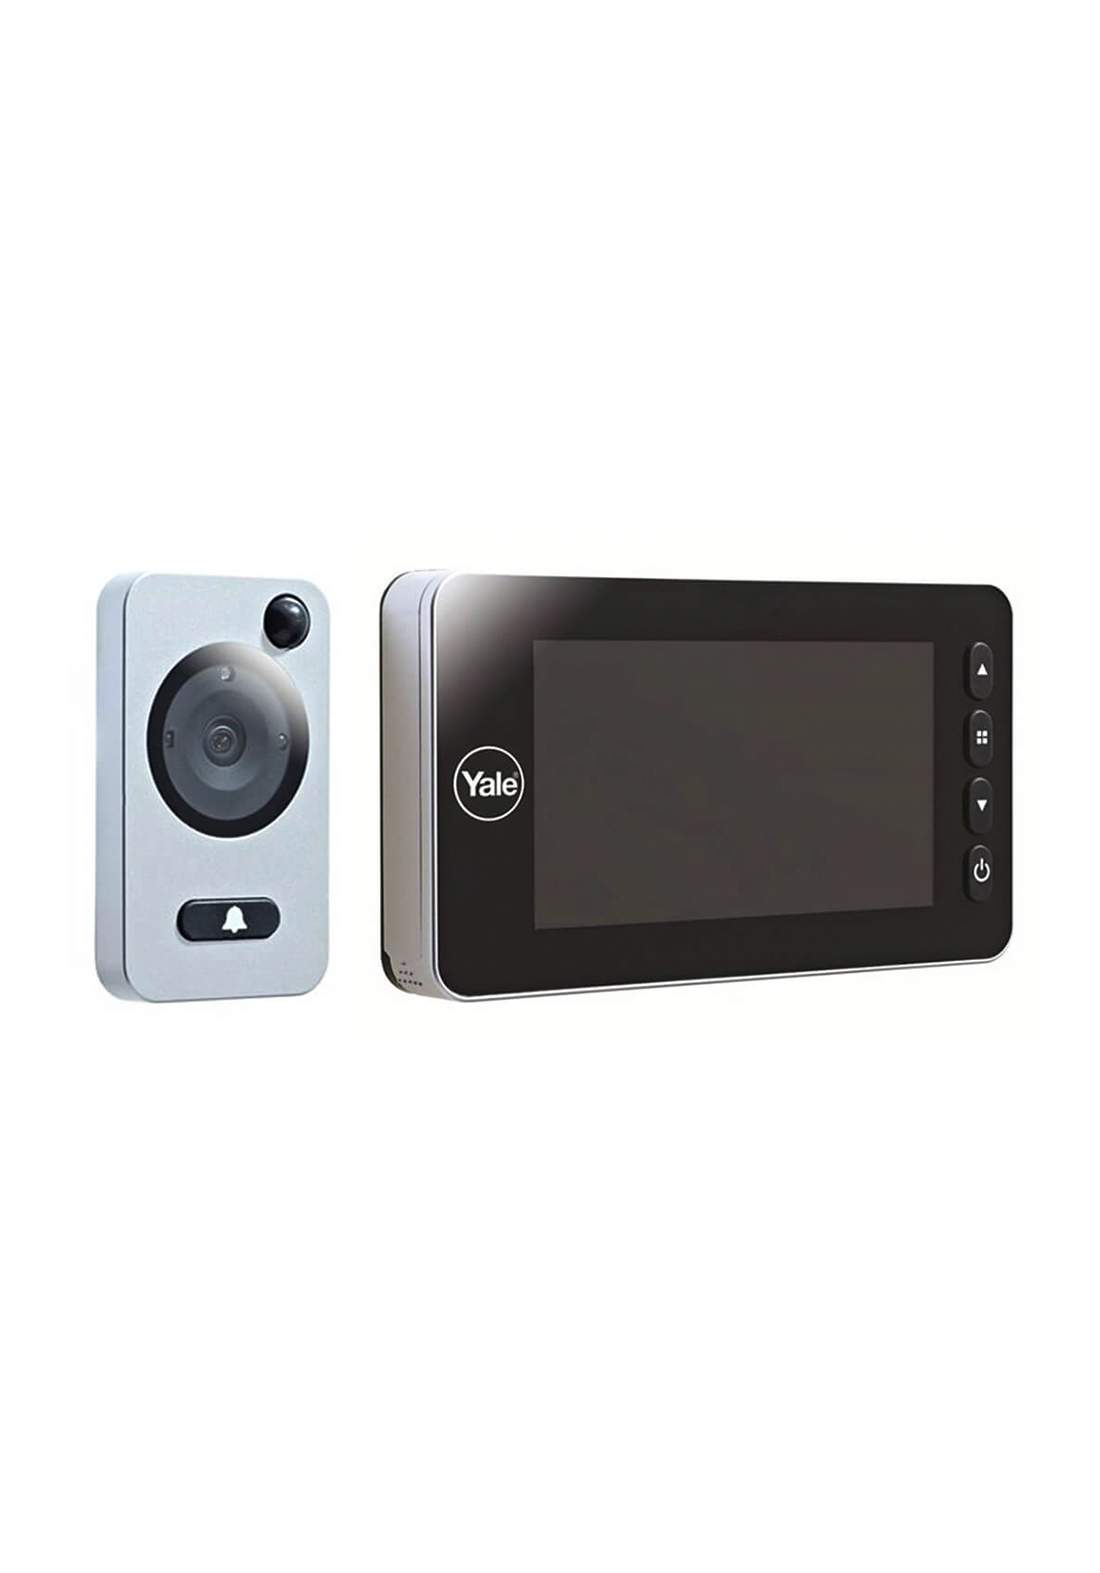 Yale 45-5800-1443-00-60-01 Digital Peephole عين سحرية الكترونية للابواب